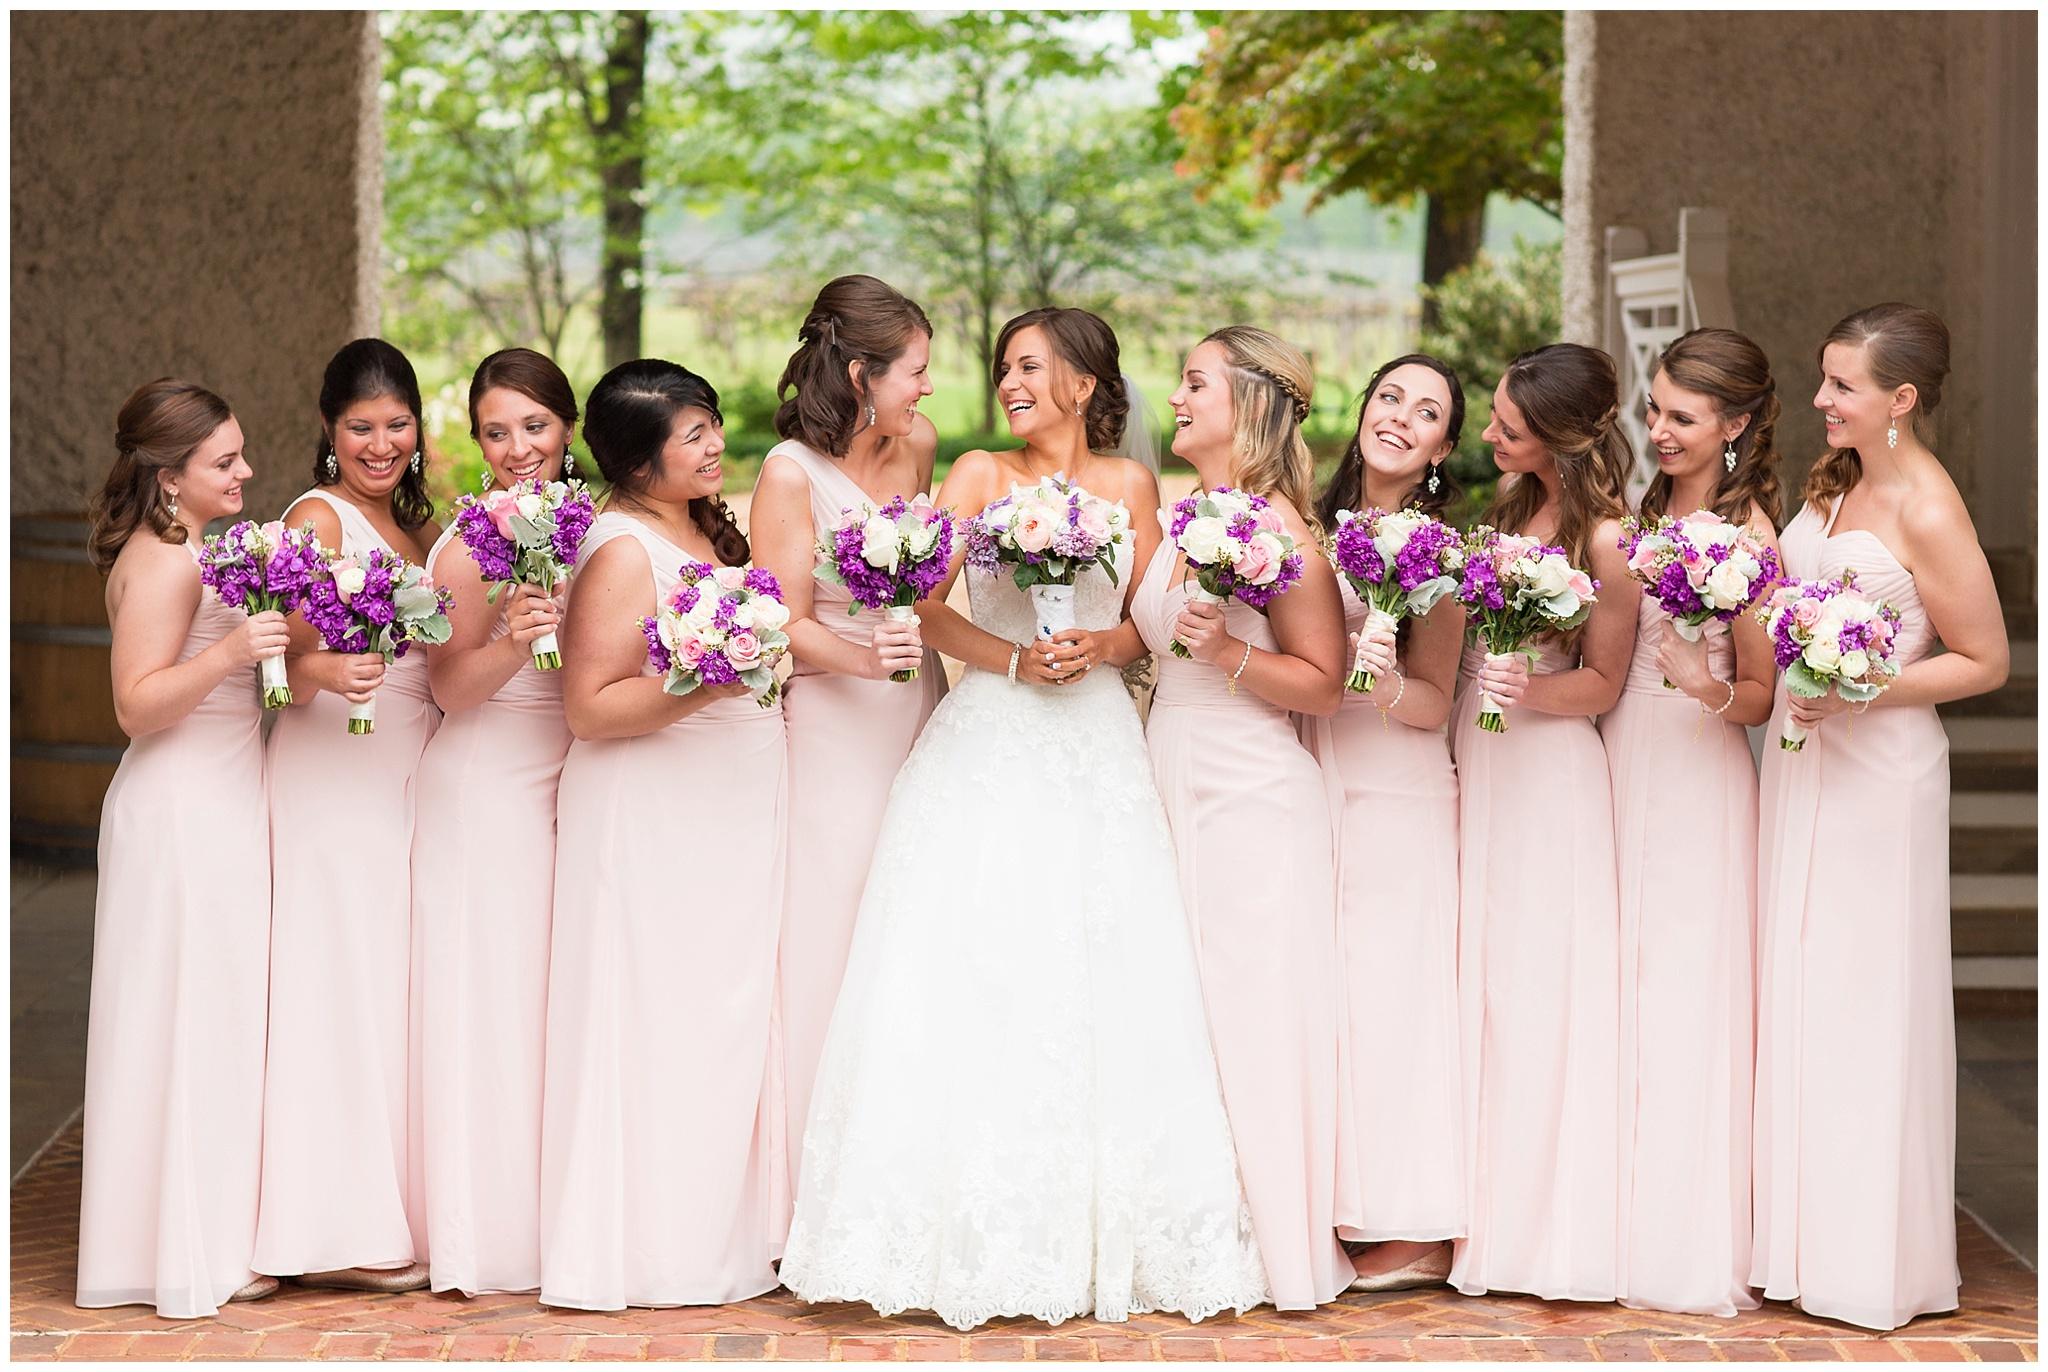 Catherine & her bridesmaids on April 25, 2015 ♥ The Herrintons Photo Videoat Keswick Vineyards   (Keswick, VA)